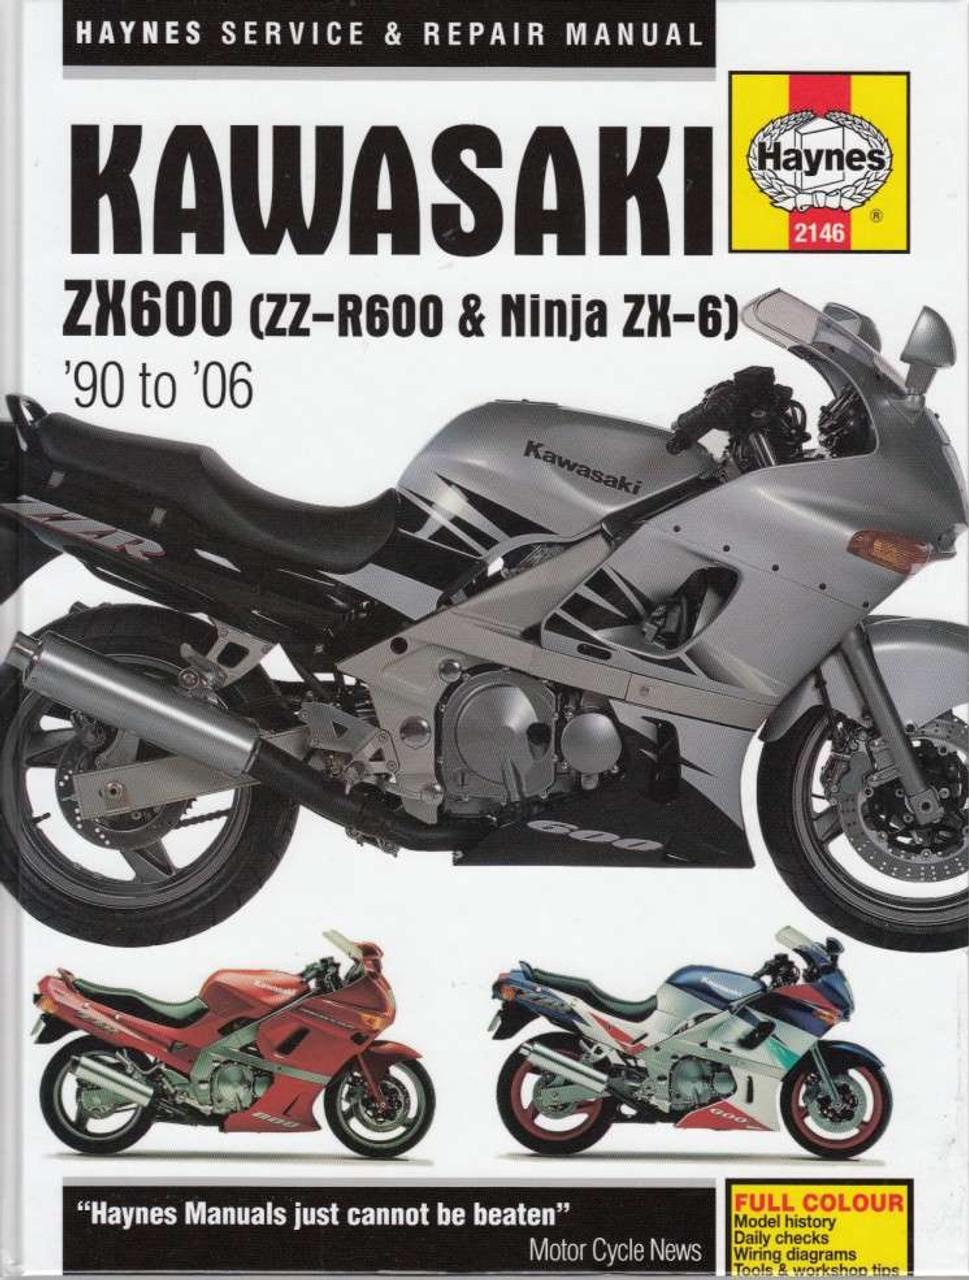 Kawasaki ZX600 (ZZ-R600, Ninja ZX-6) 1990 - 2006 Workshop Manual on